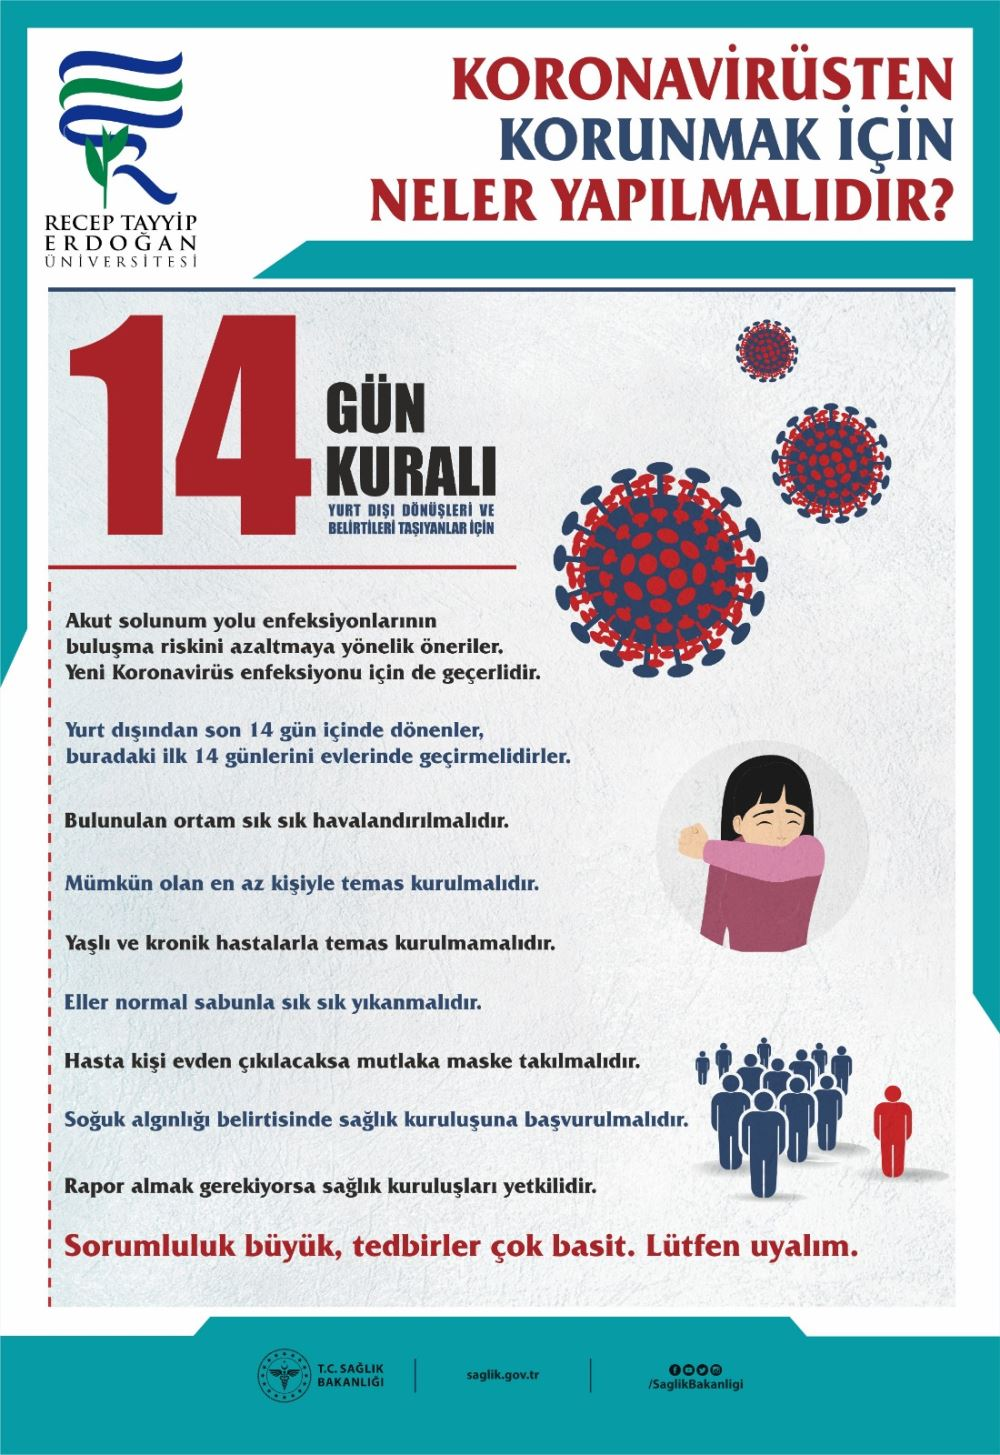 Koronavirüs (COVİD-19) 14 Kural